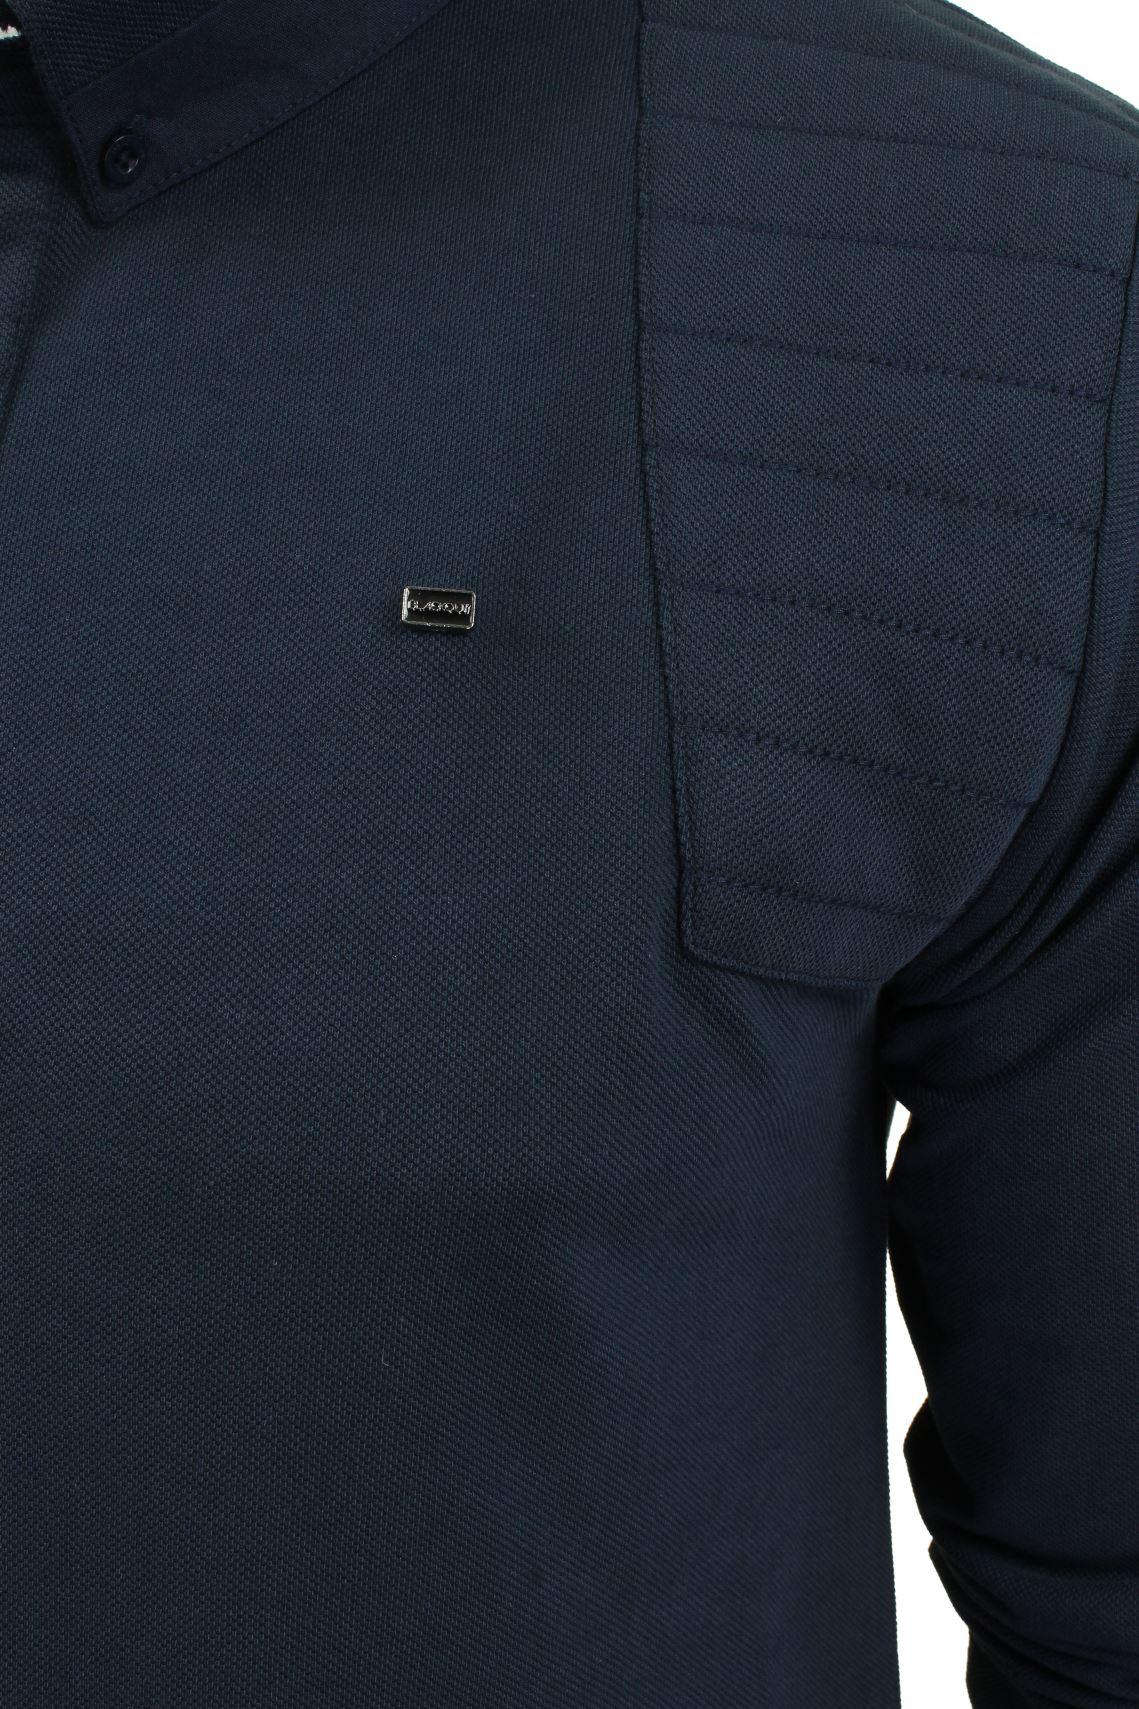 Camisa-Polo-para-hombre-Manga-corta-desde-el-apagon-Collection-by-Voi-Jeans miniatura 3